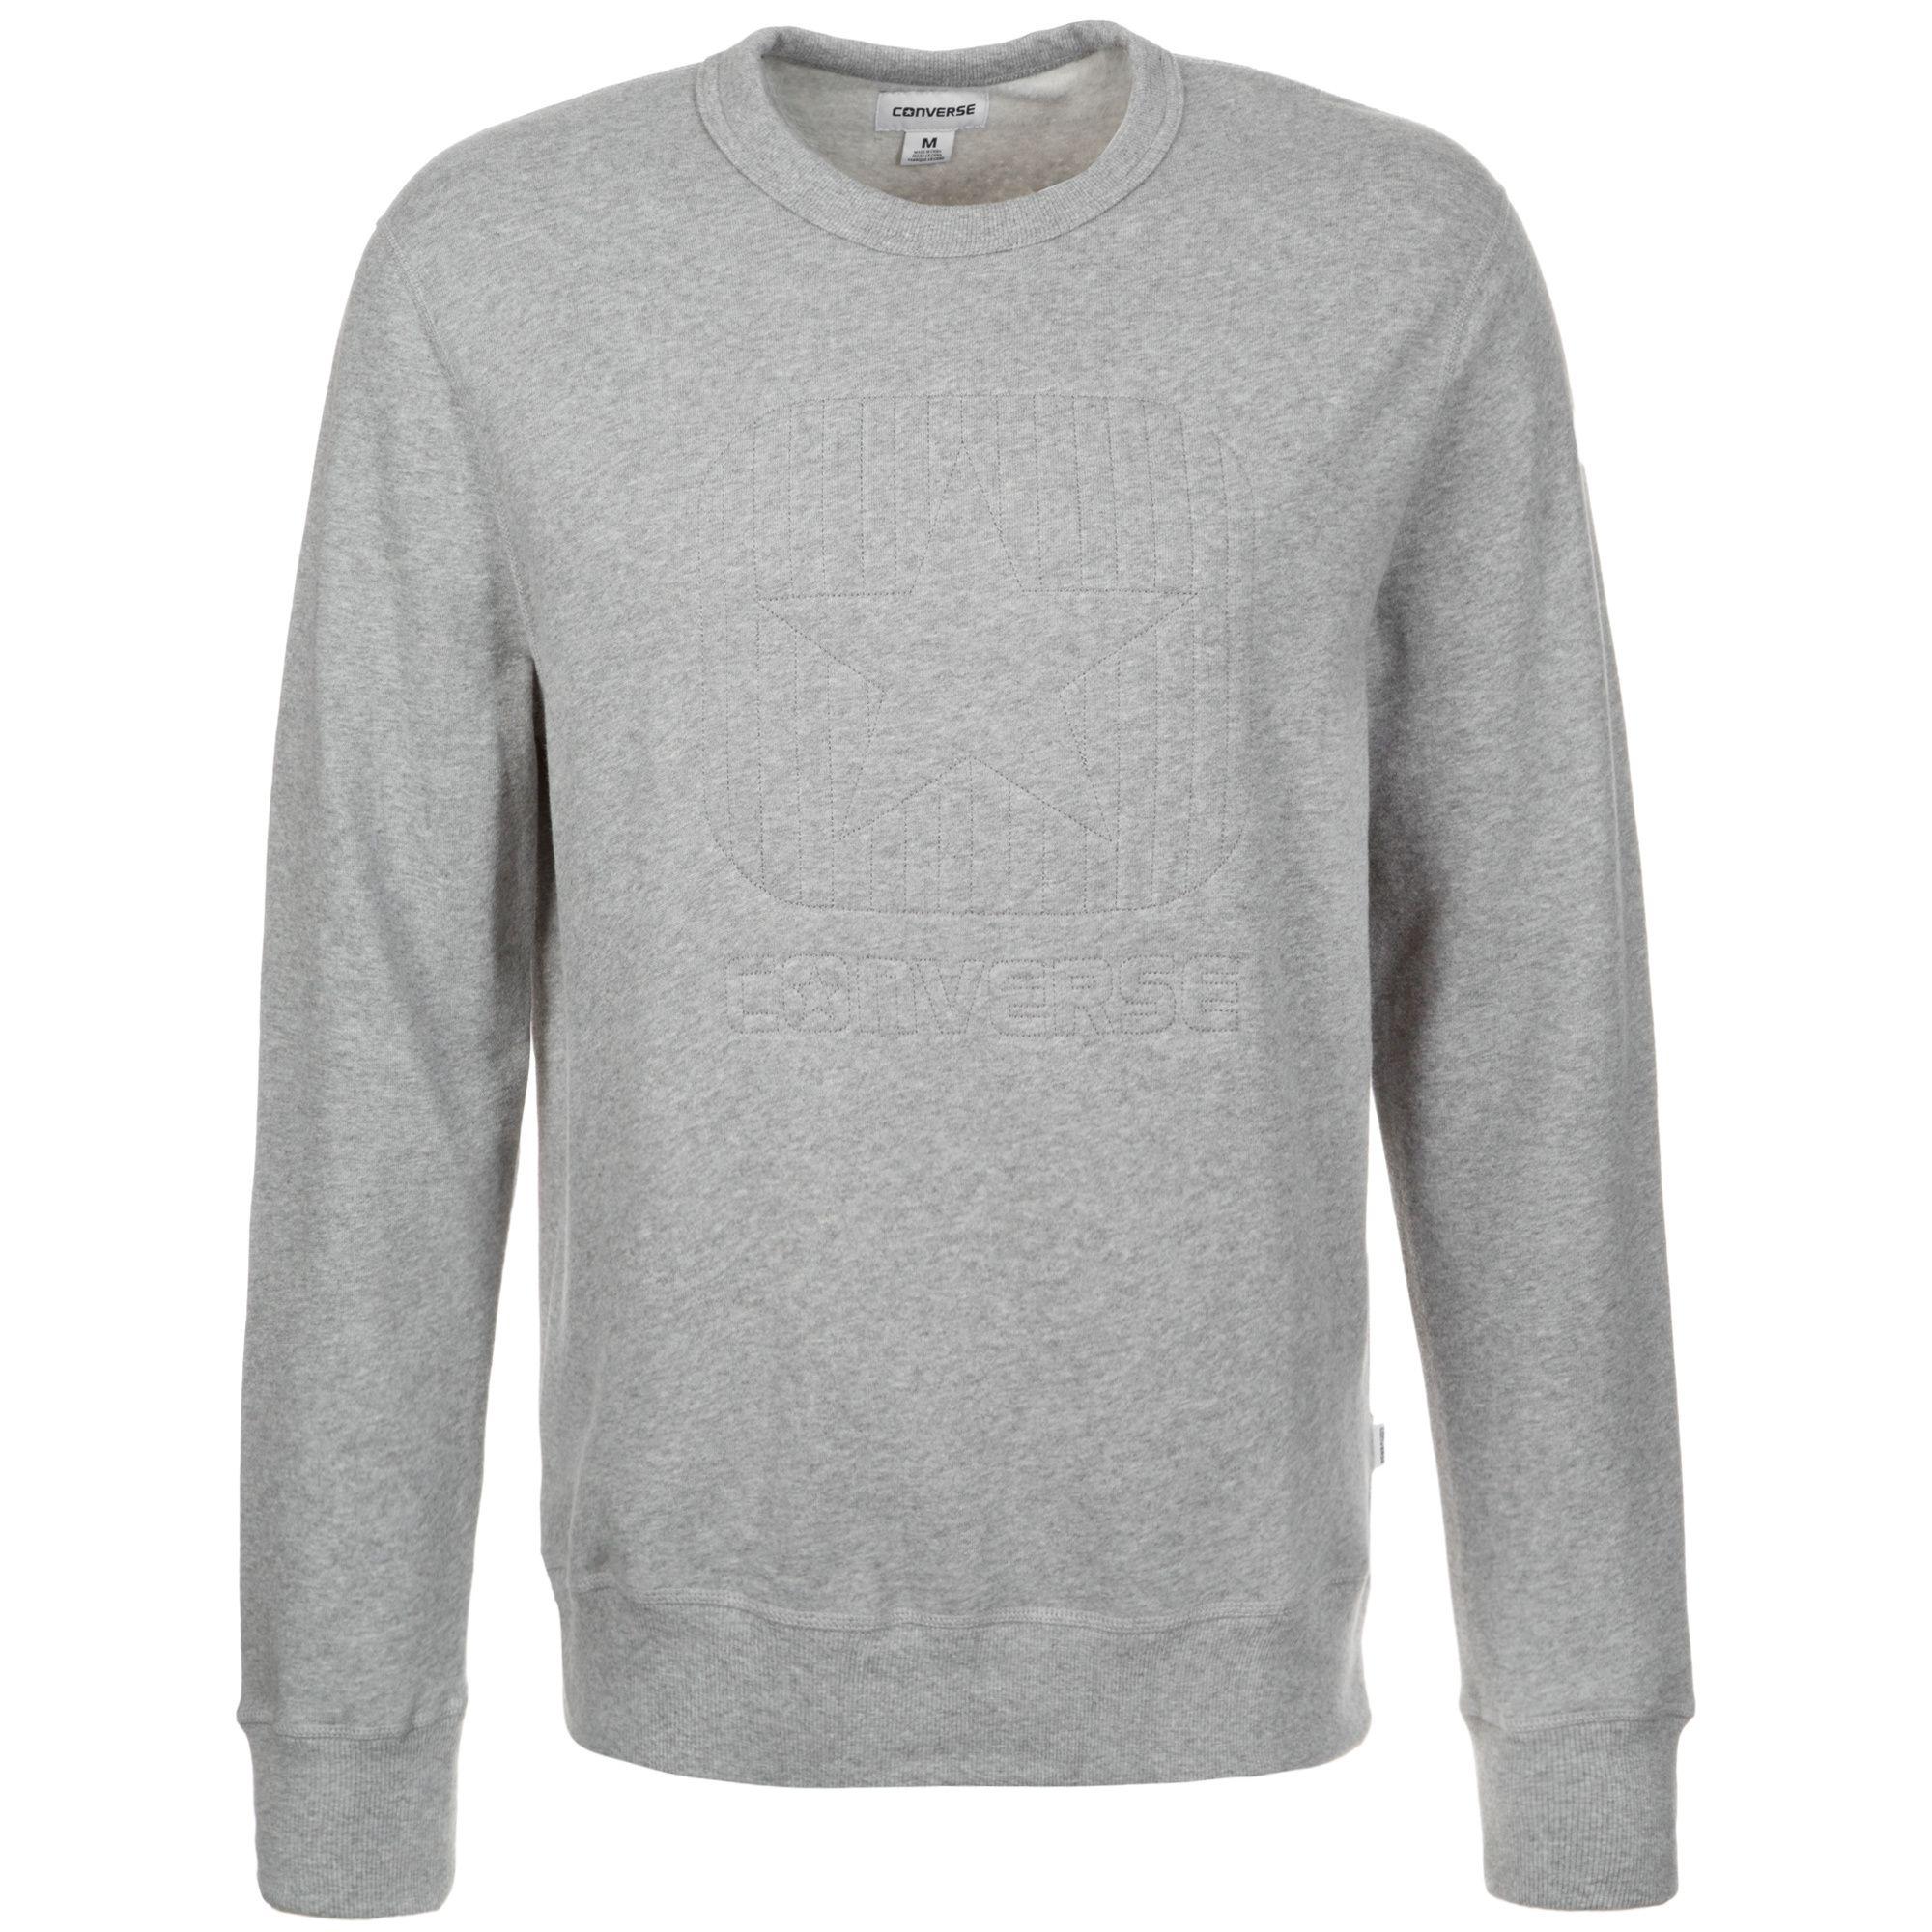 CONVERSE Converse Box Star Quilted Crew Sweatshirt Herren